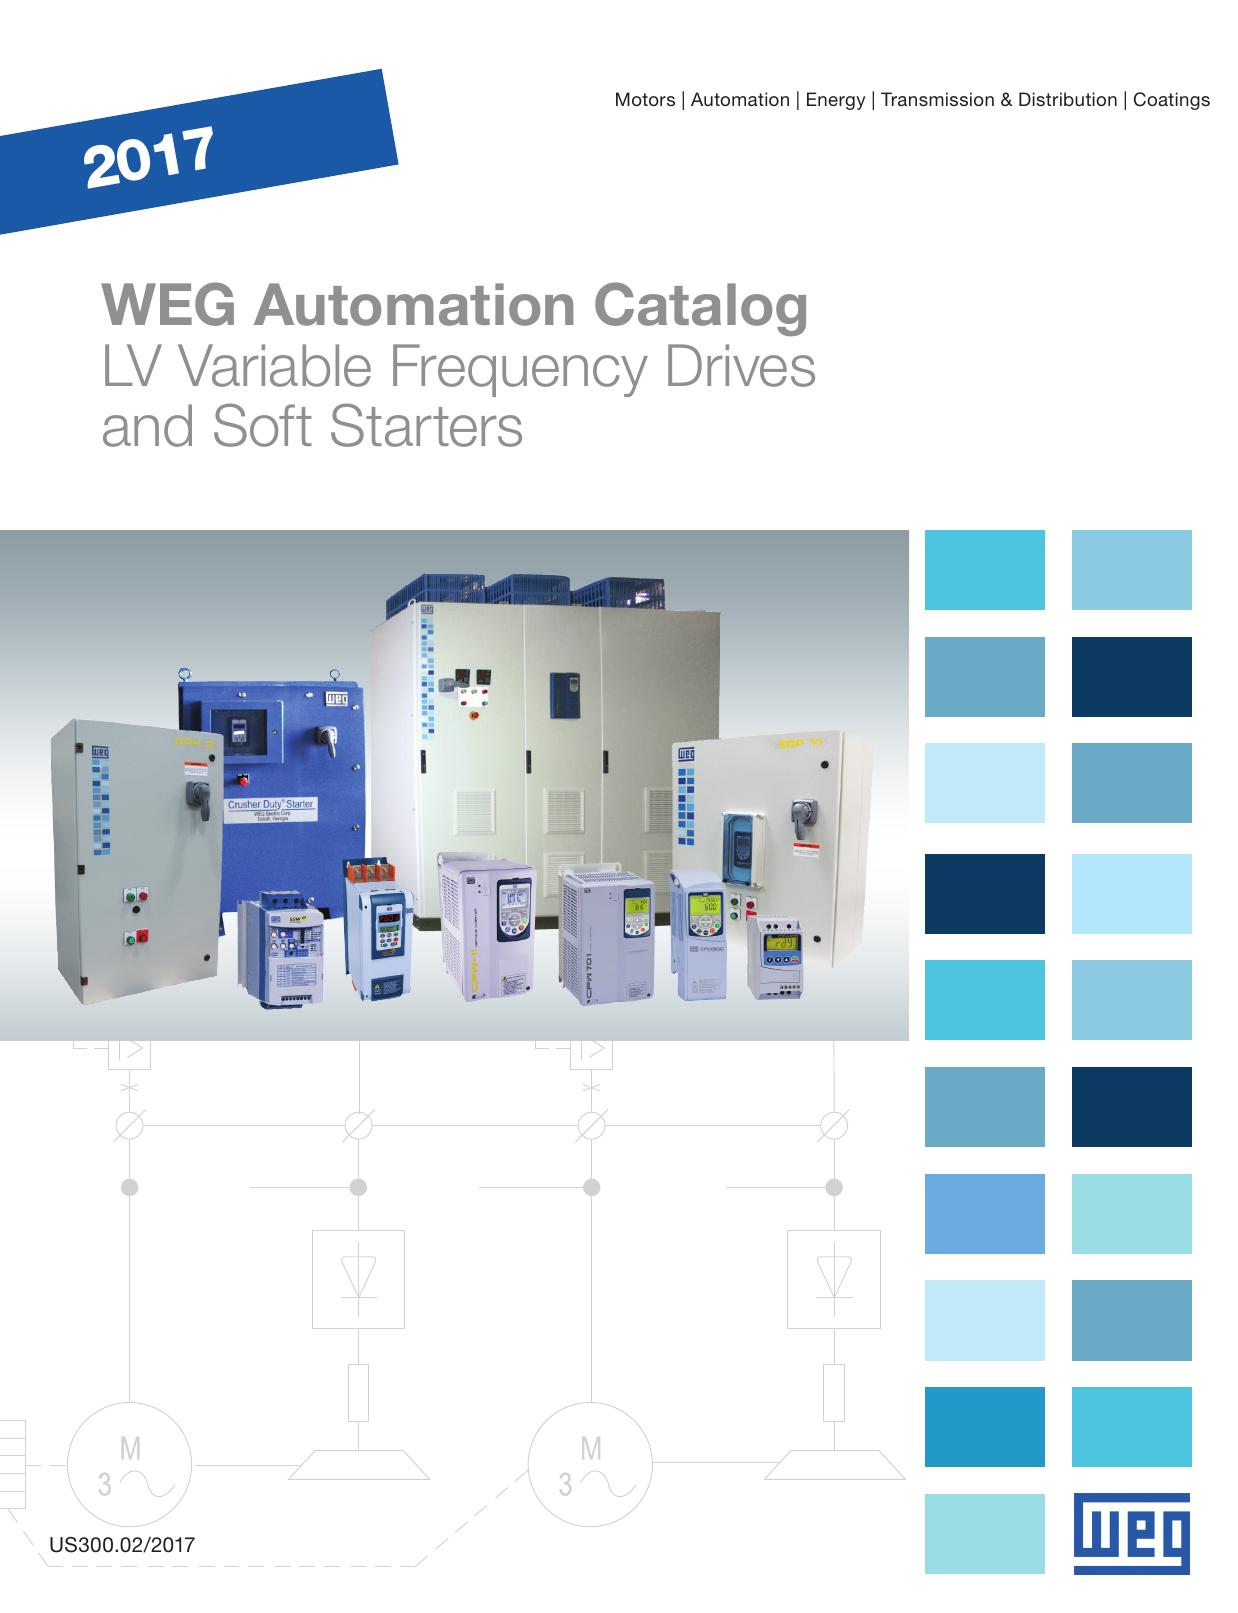 WEG SOFT START SSW050016T2246EPZ FOR 5-HP MOTOR* 230 Volt 3 Phase